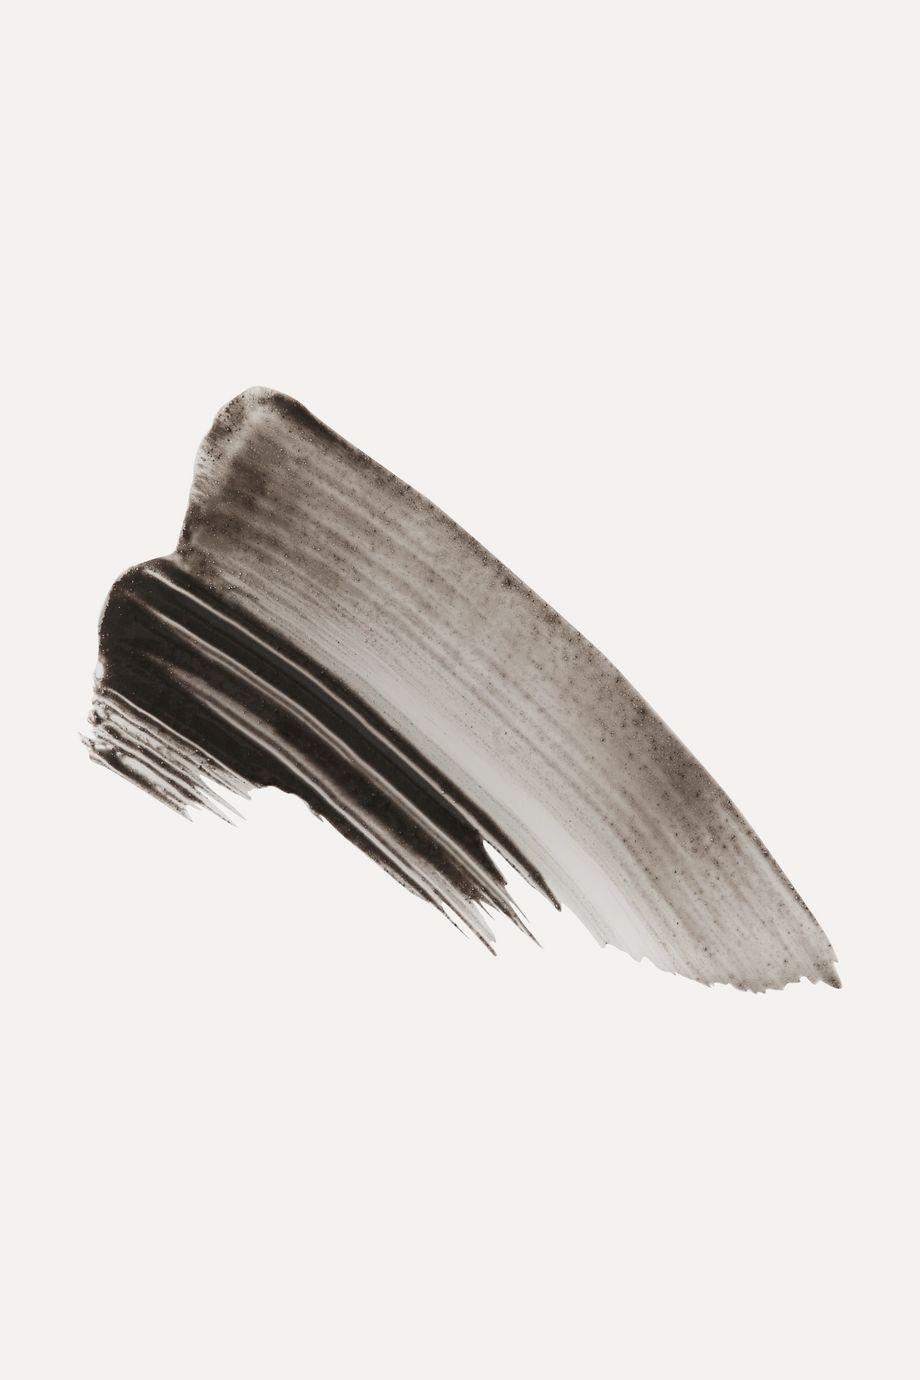 LashFood BrowFood Velvet 3D Brow Glide - Dark Brunette